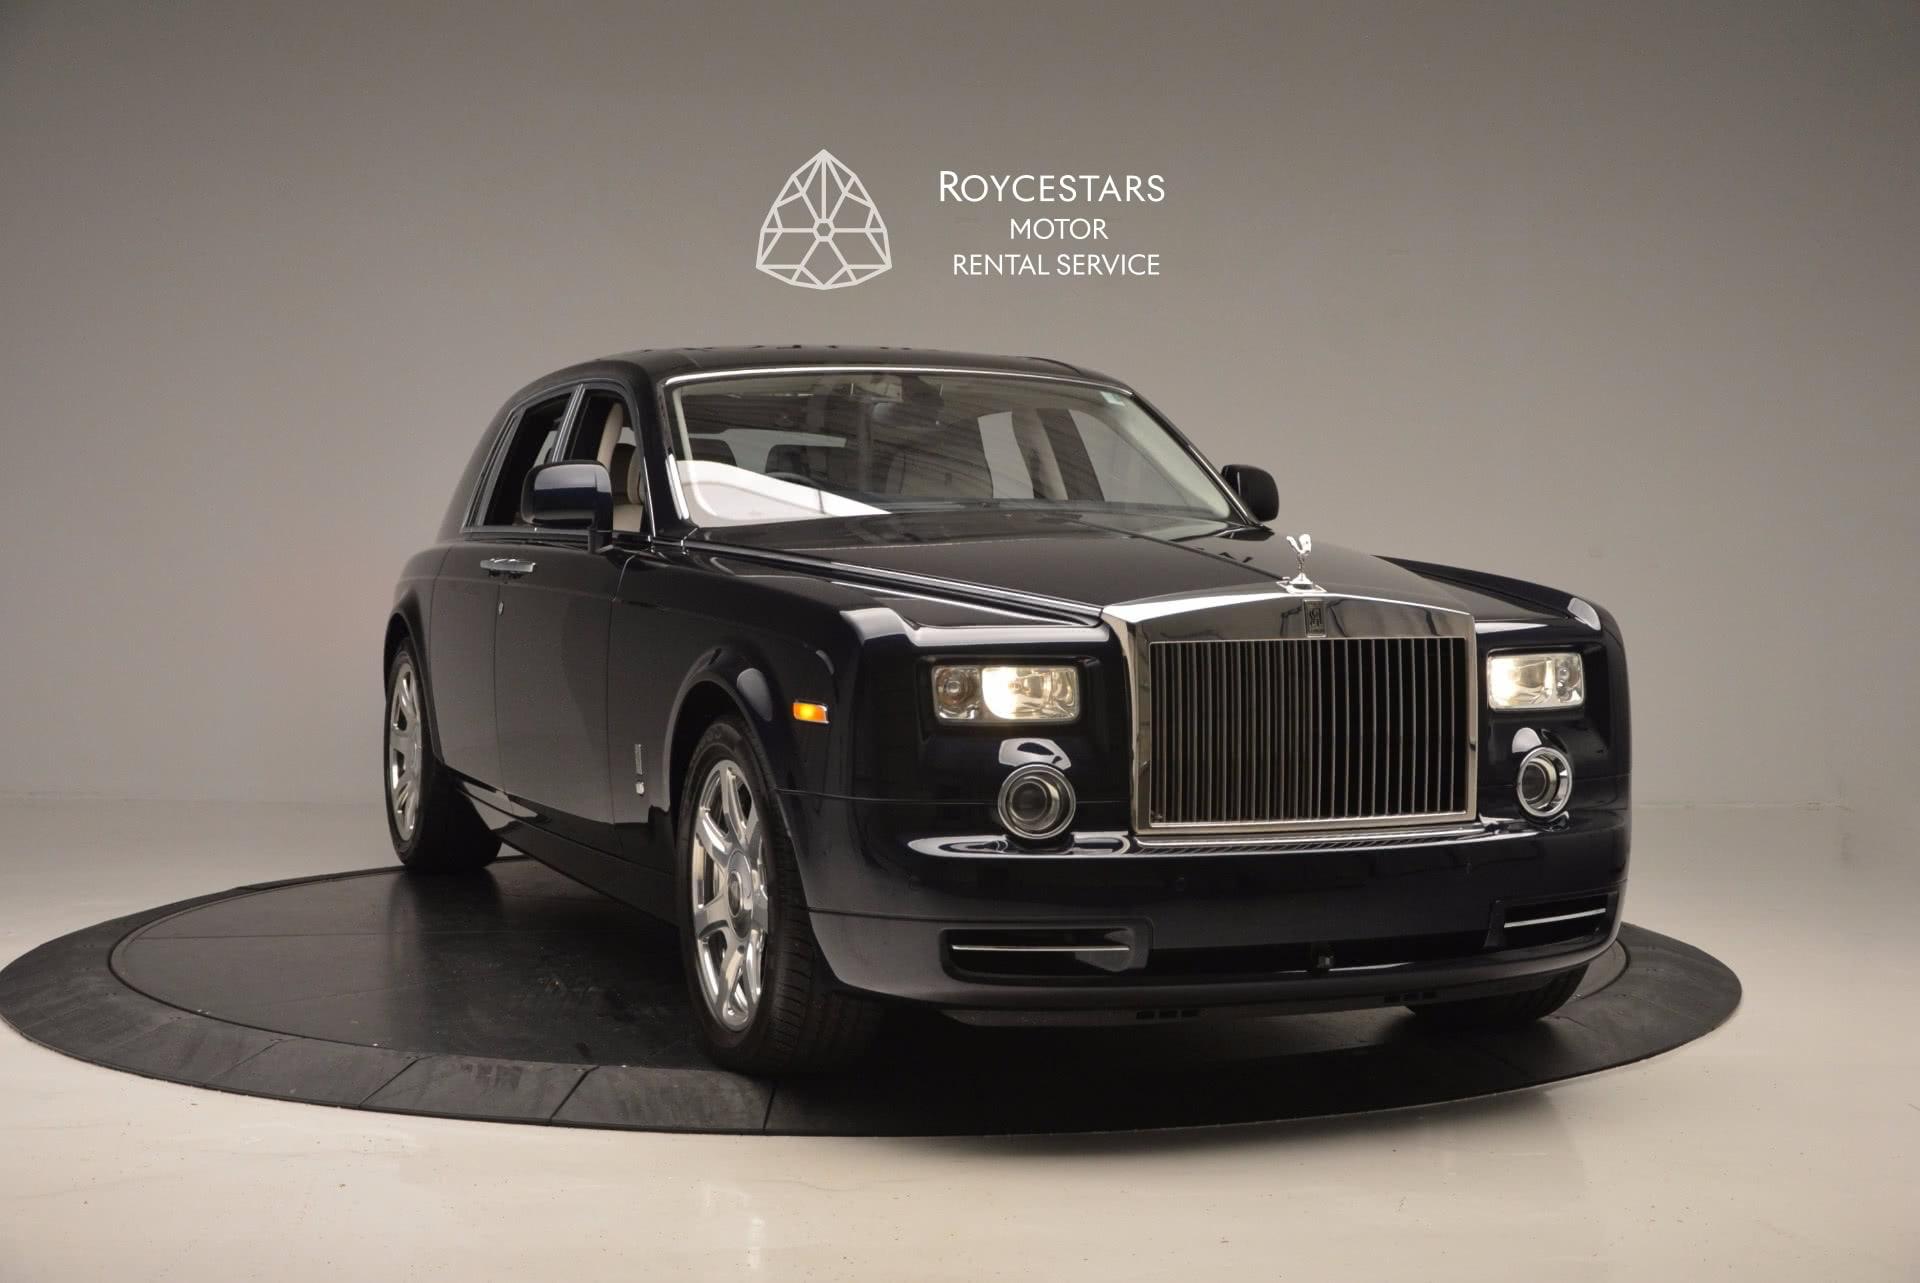 Rolls-Royce-Phantom-2010-roycestars-3